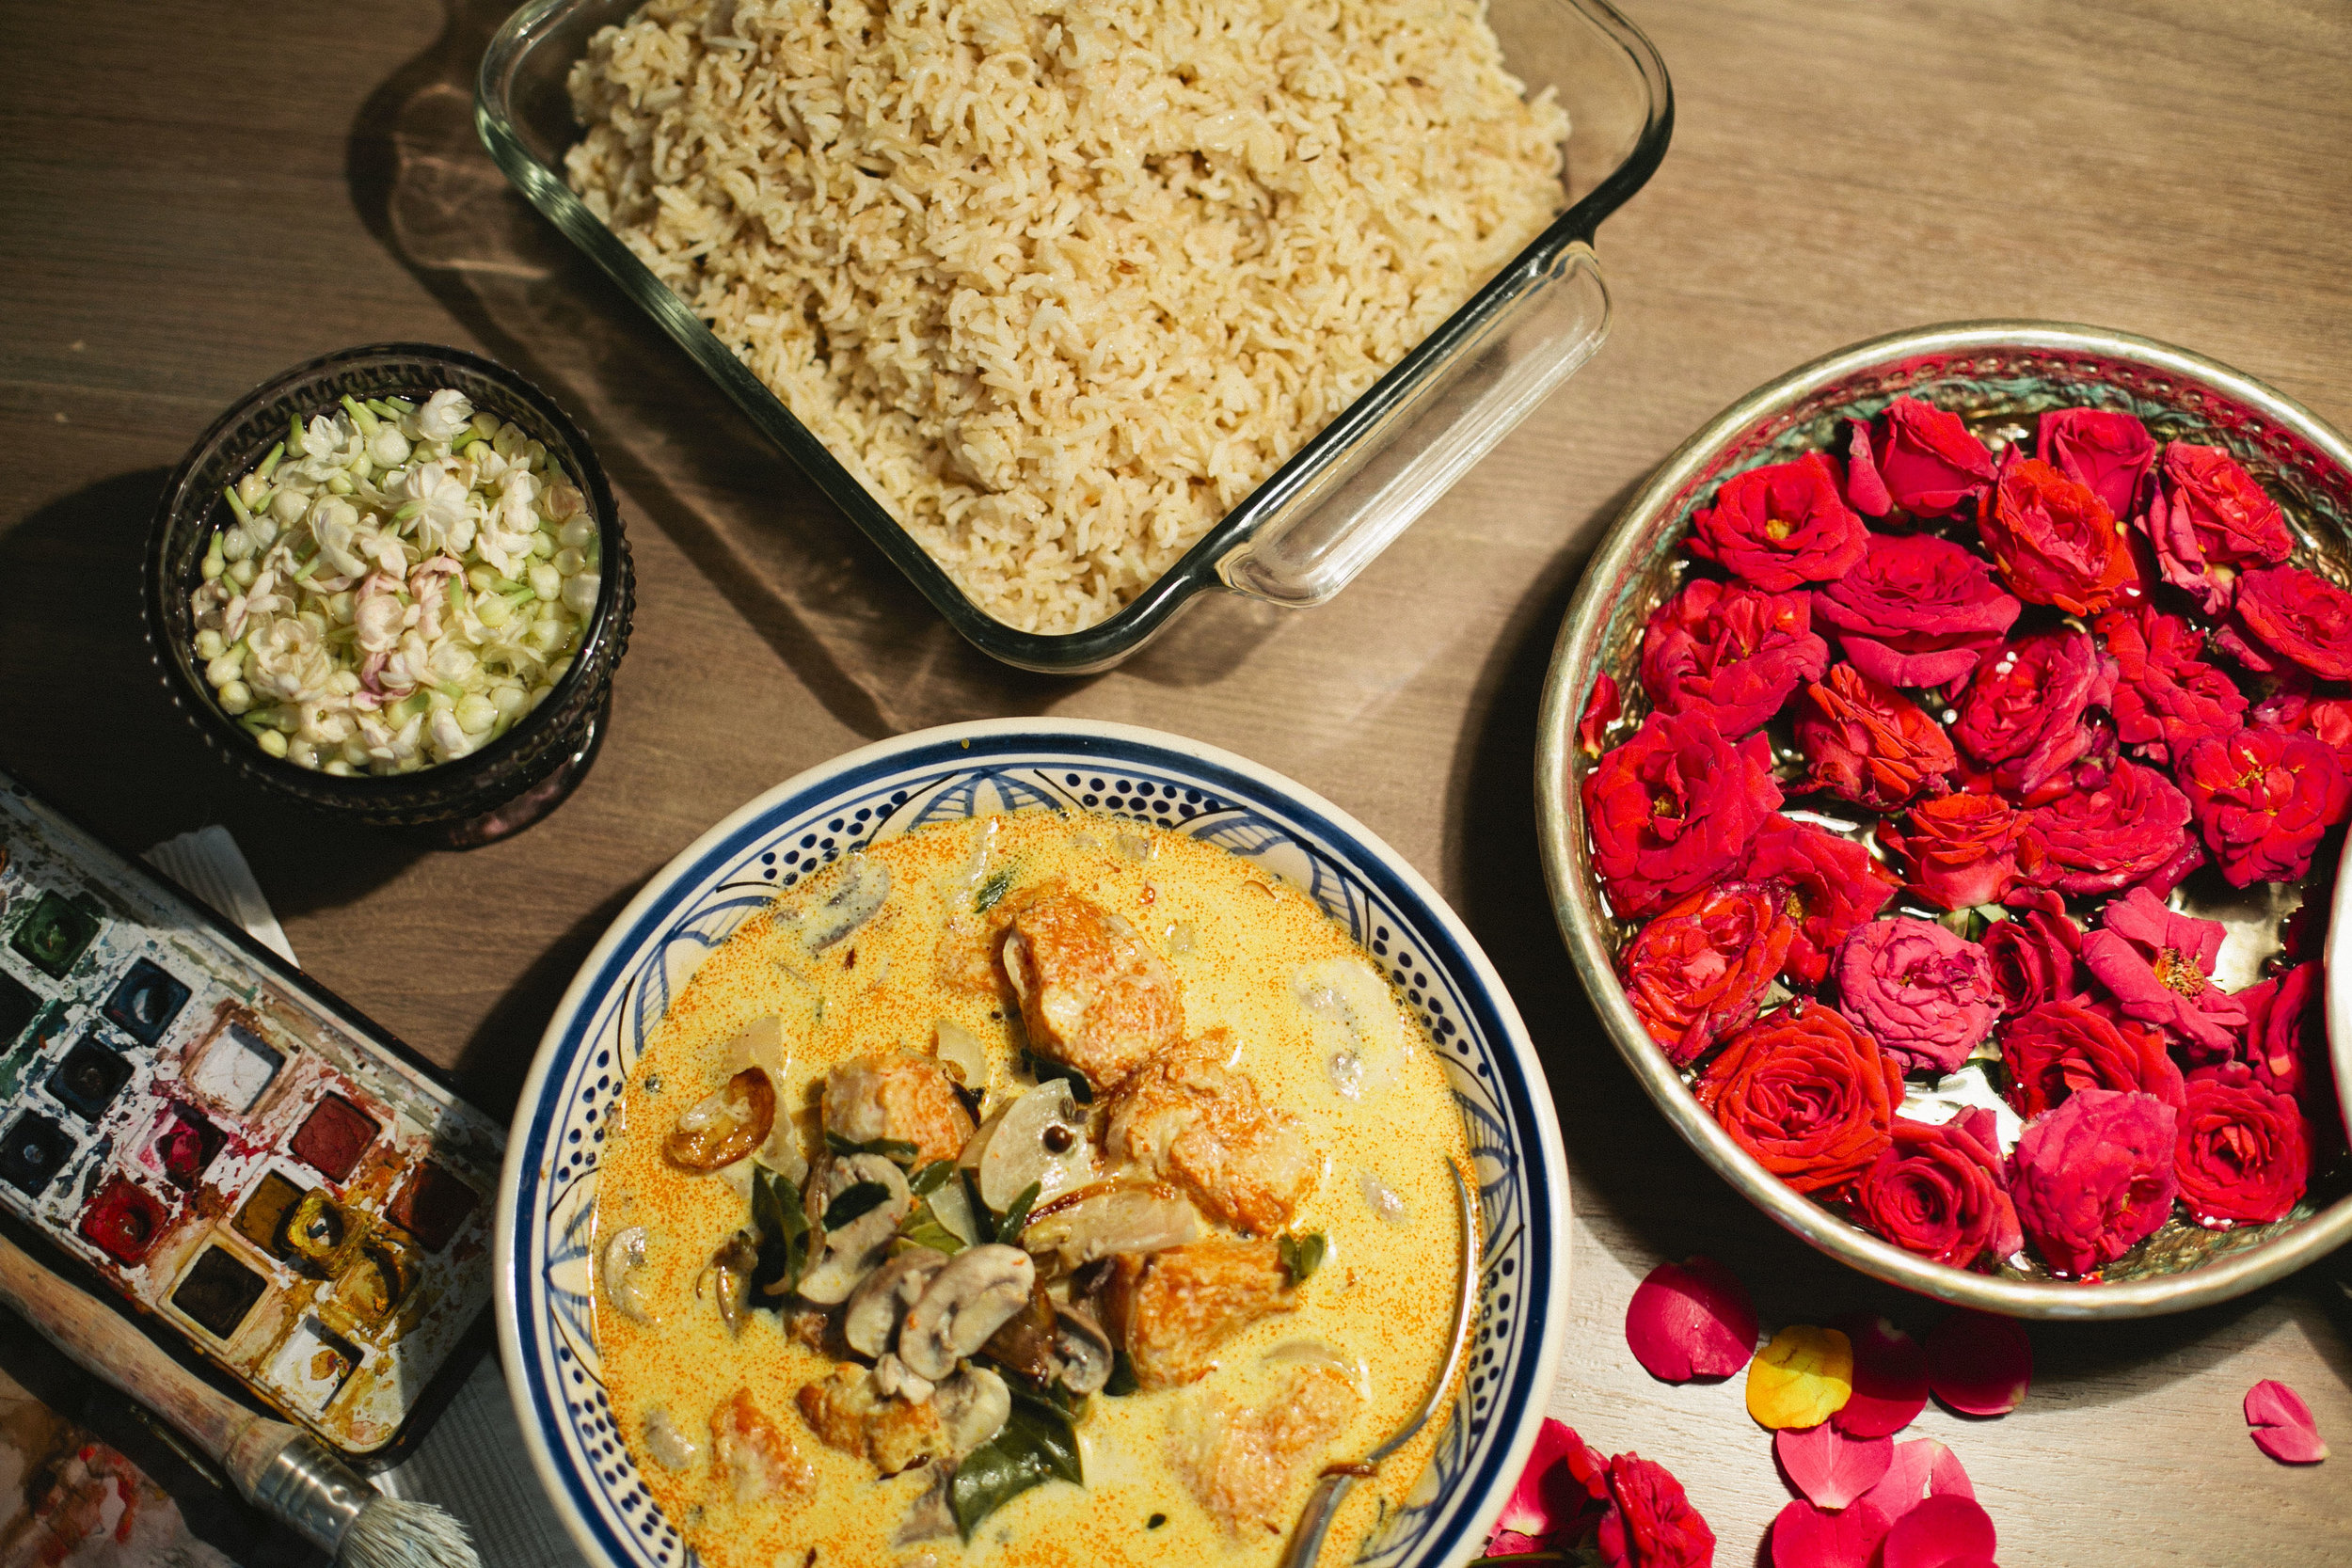 Shilo Suleman and Avijit Michael make fish stew | #1000Kitchens